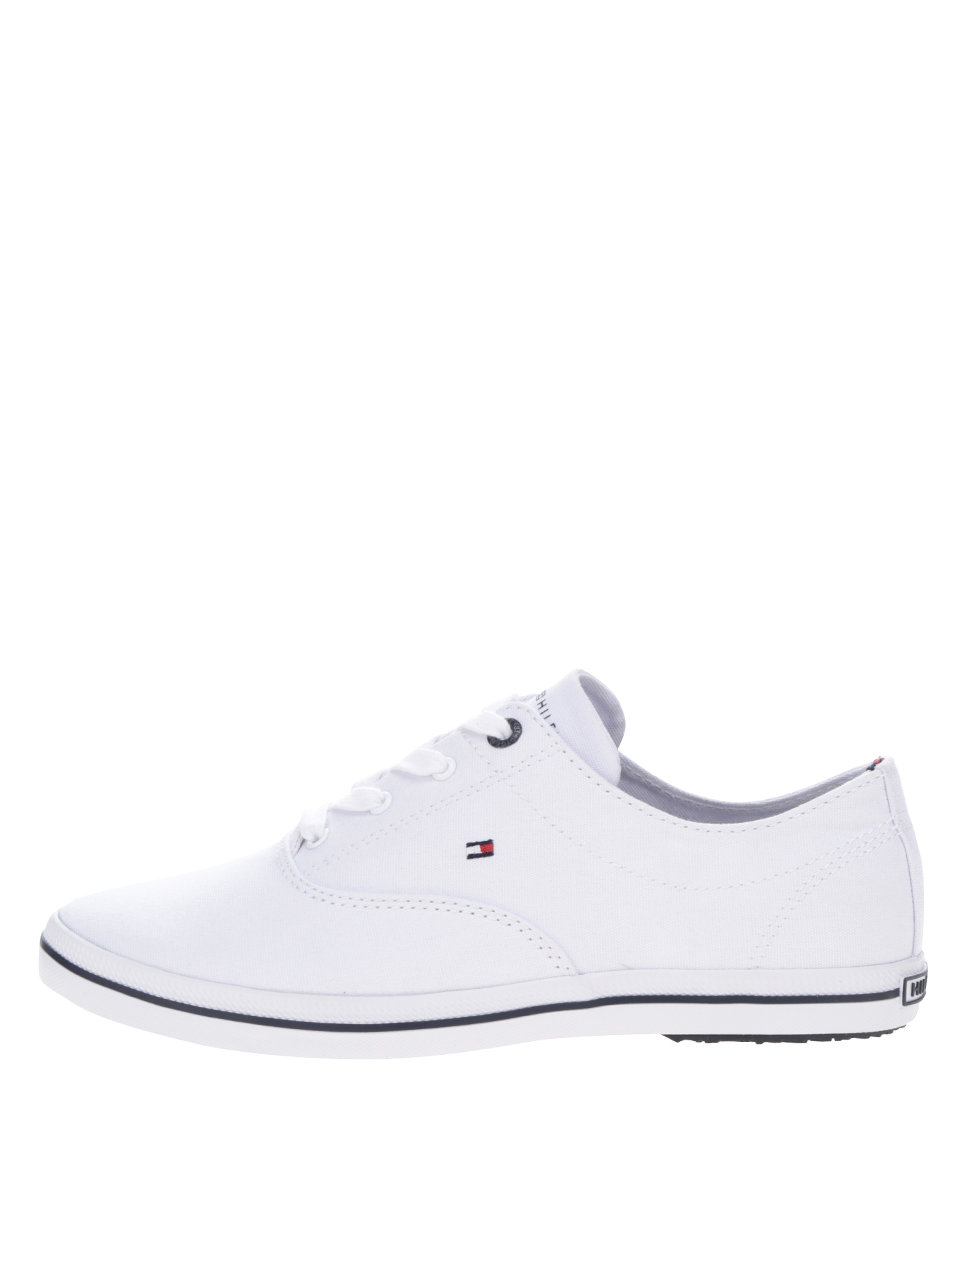 Biele dámske tenisky Tommy Hilfiger ... bf7ec68451c